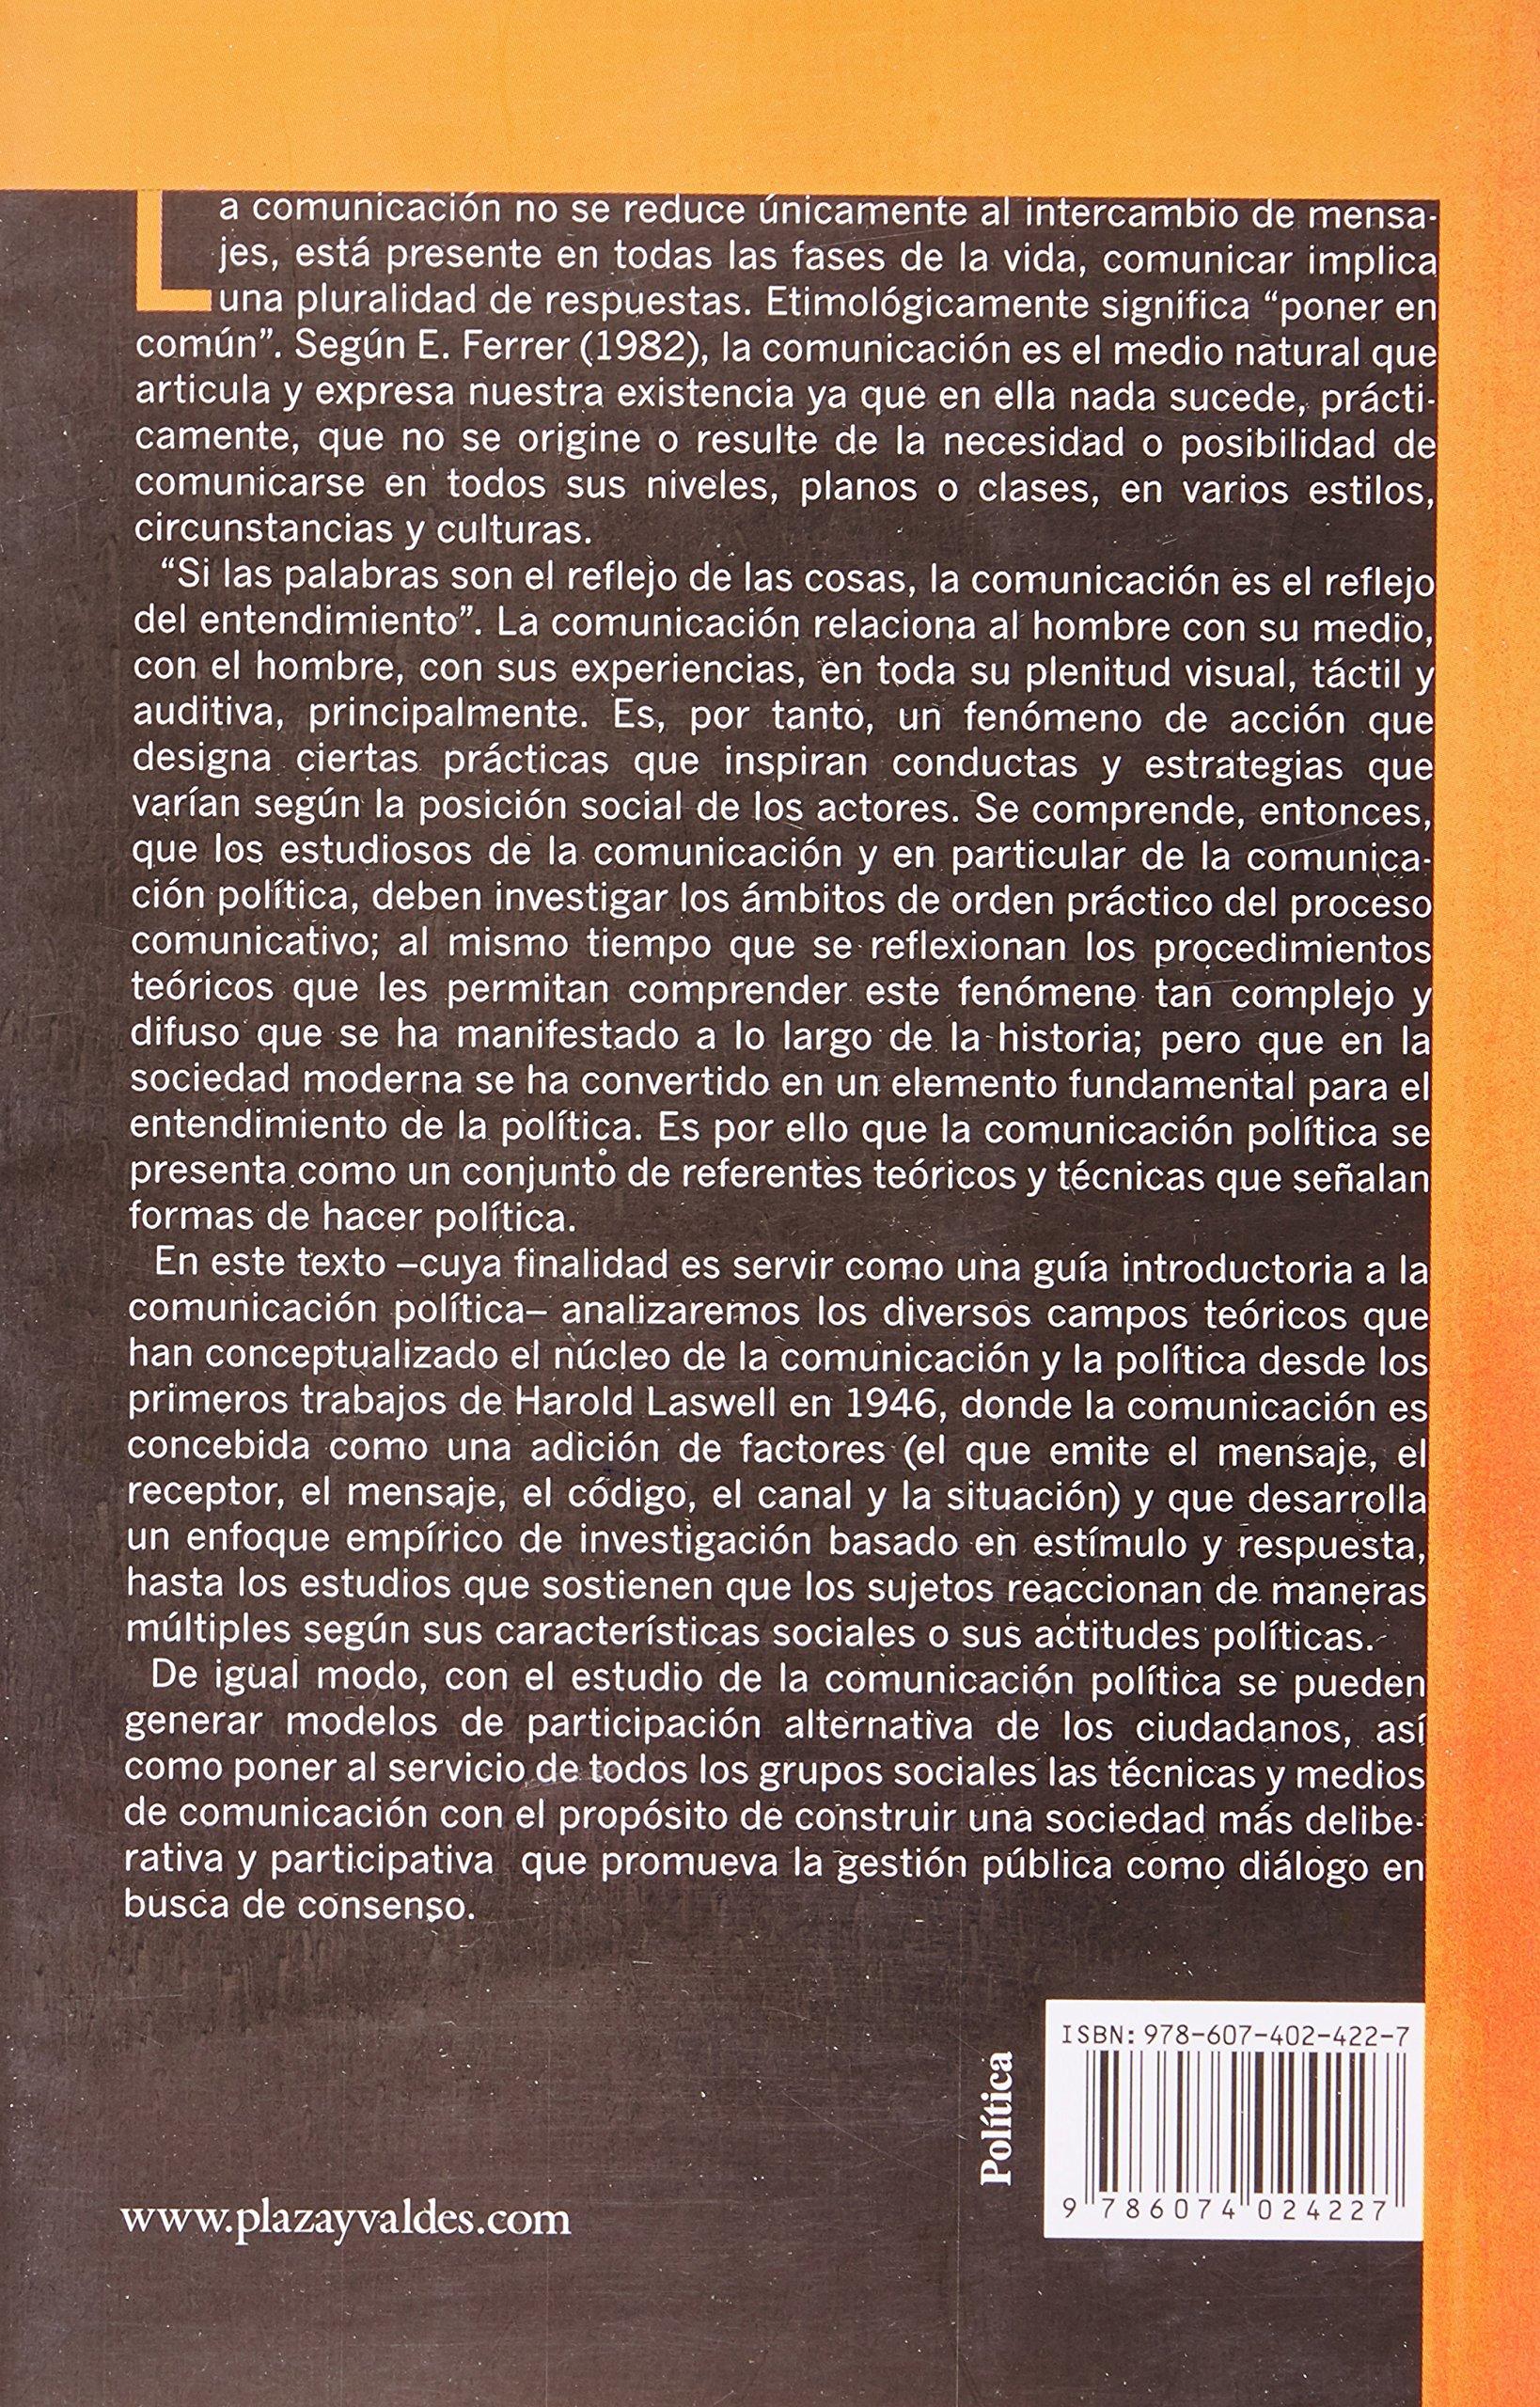 Metodologia de la comunicacion politica en campanas electorales (Spanish Edition): Martin Mora Ledesma: 9786074024227: Amazon.com: Books